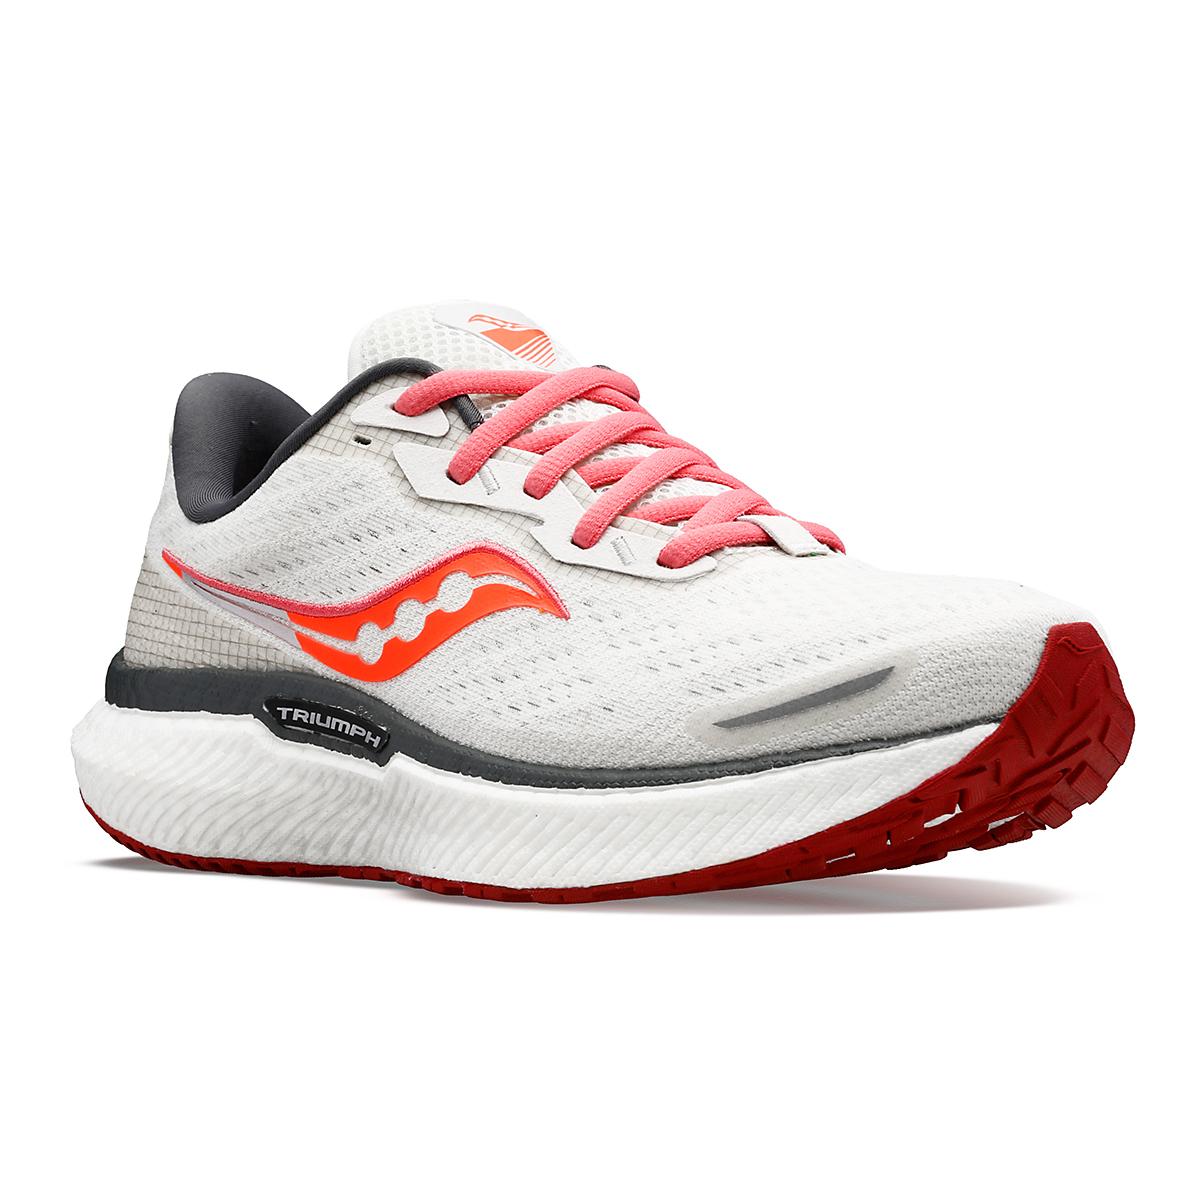 Women's Saucony Triumph 19 Running Shoe - Color: Jackalope - Size: 5 - Width: Regular, Jackalope, large, image 5